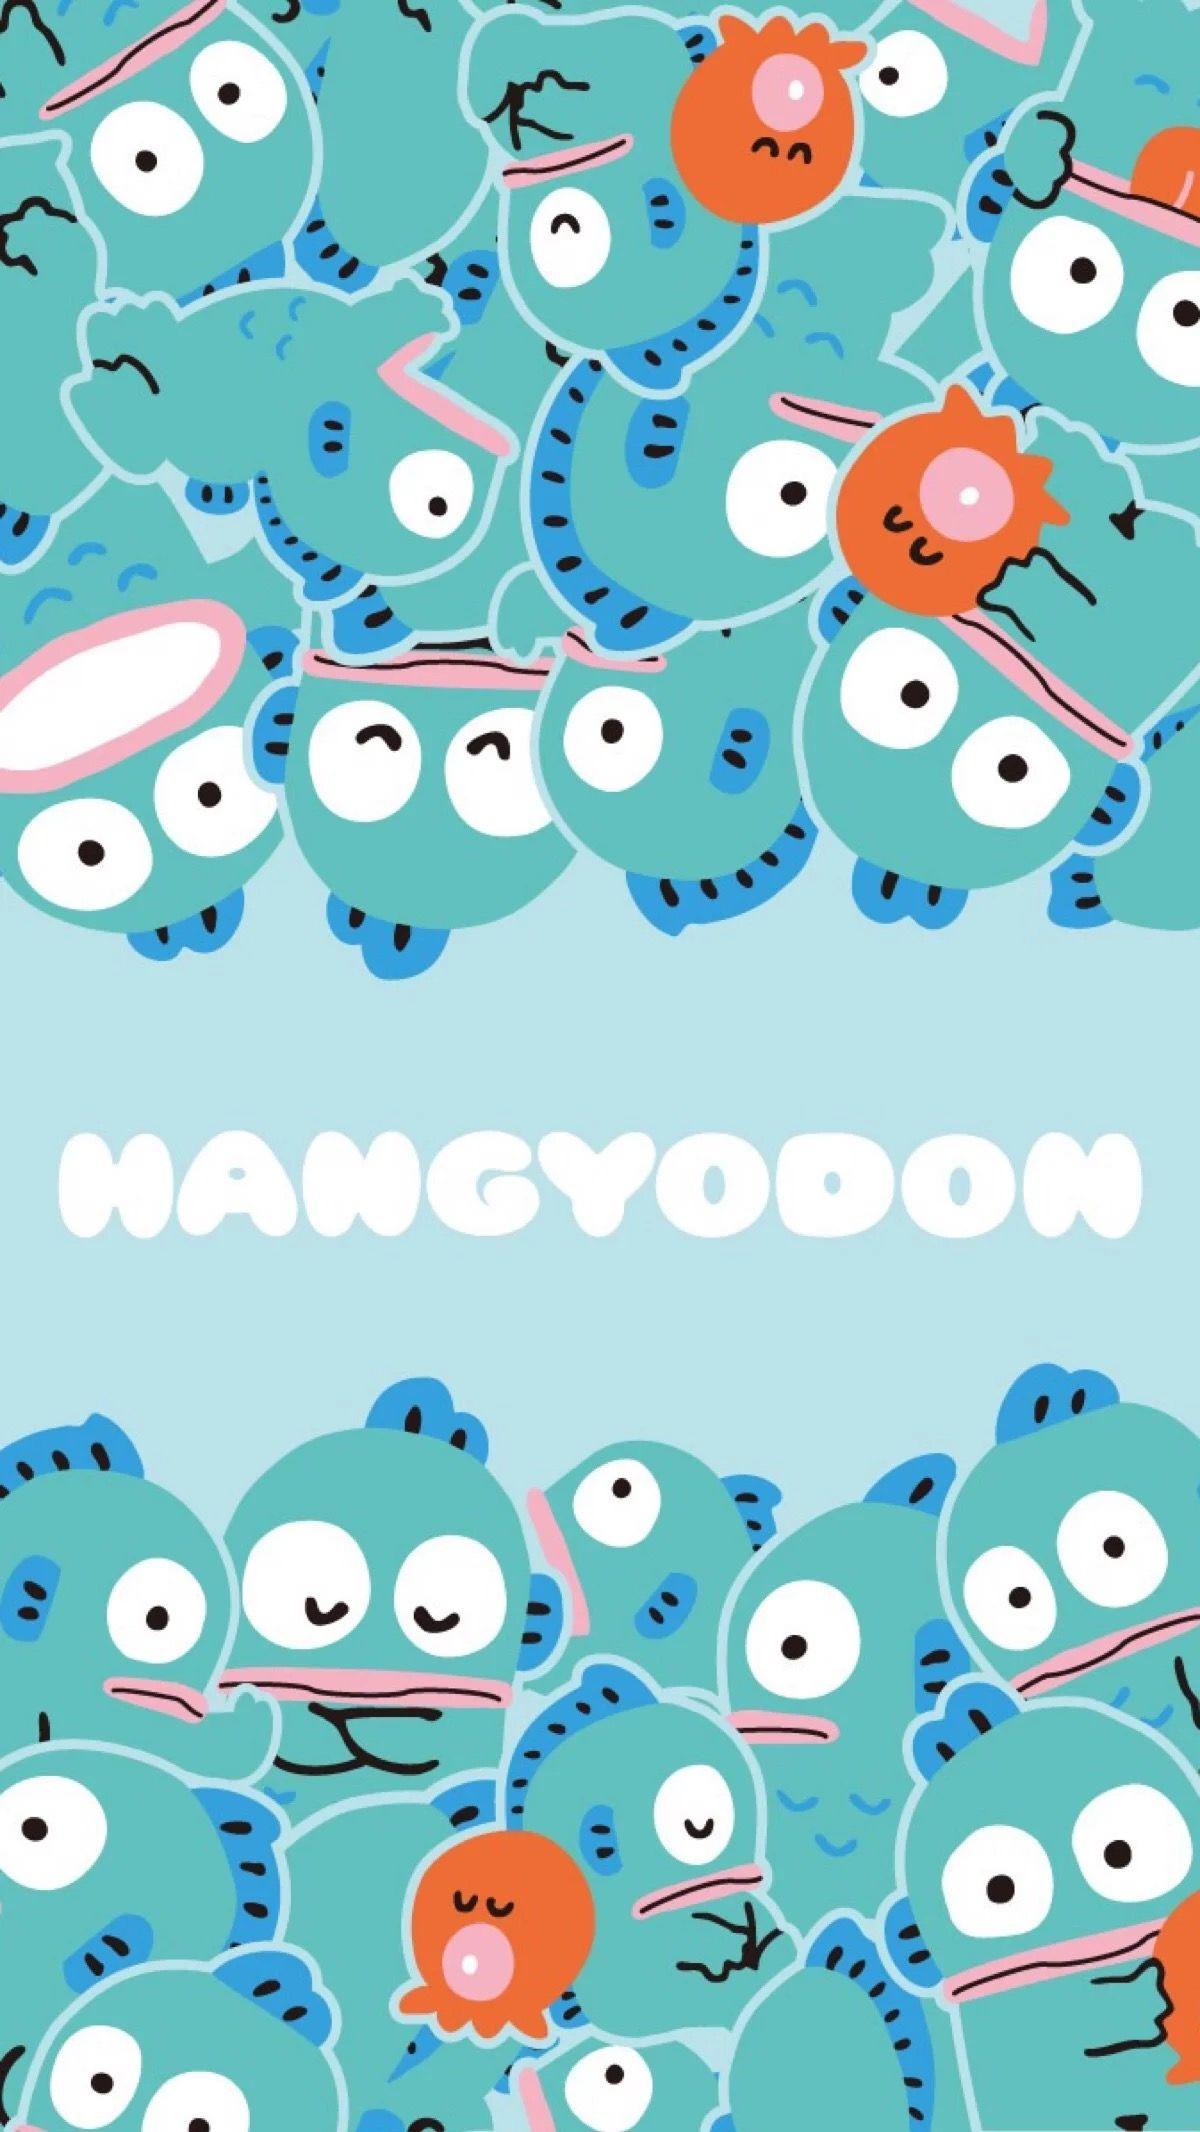 Hangyodon サンリオ 壁紙 かわいい かわいいイラスト